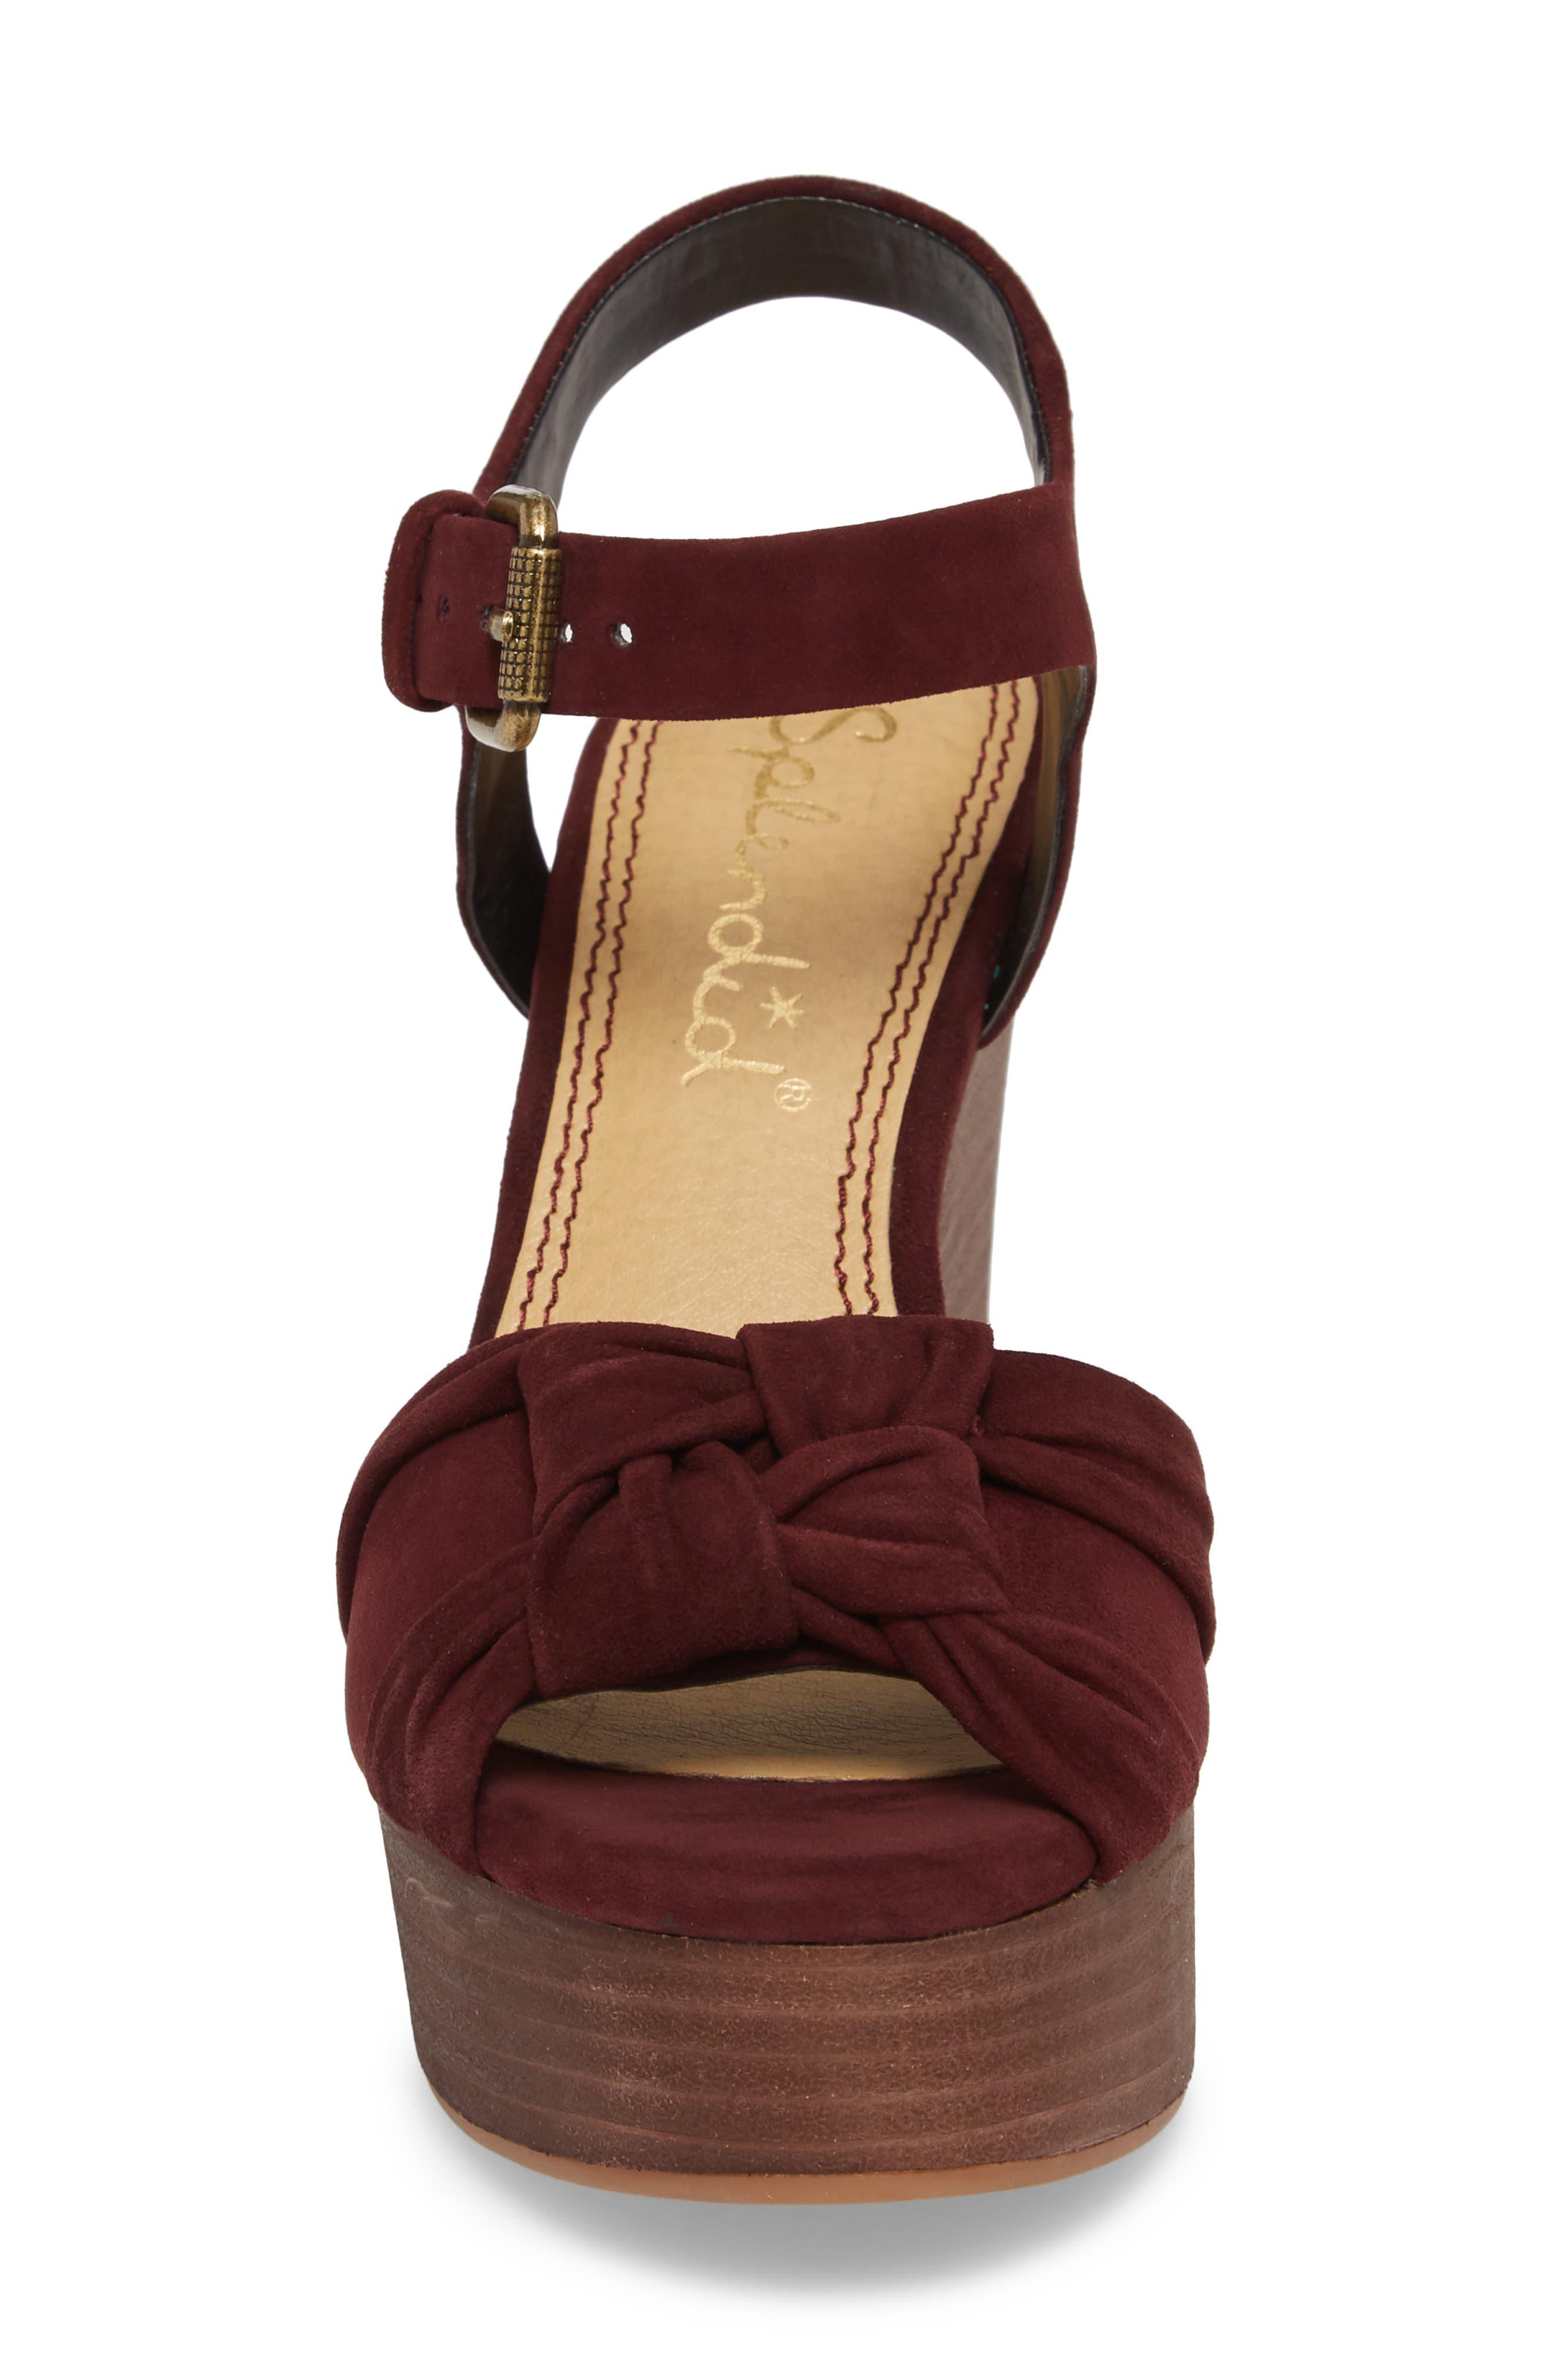 Nada Platform Wedge Sandal,                             Alternate thumbnail 3, color,                             Deep Plum Suede